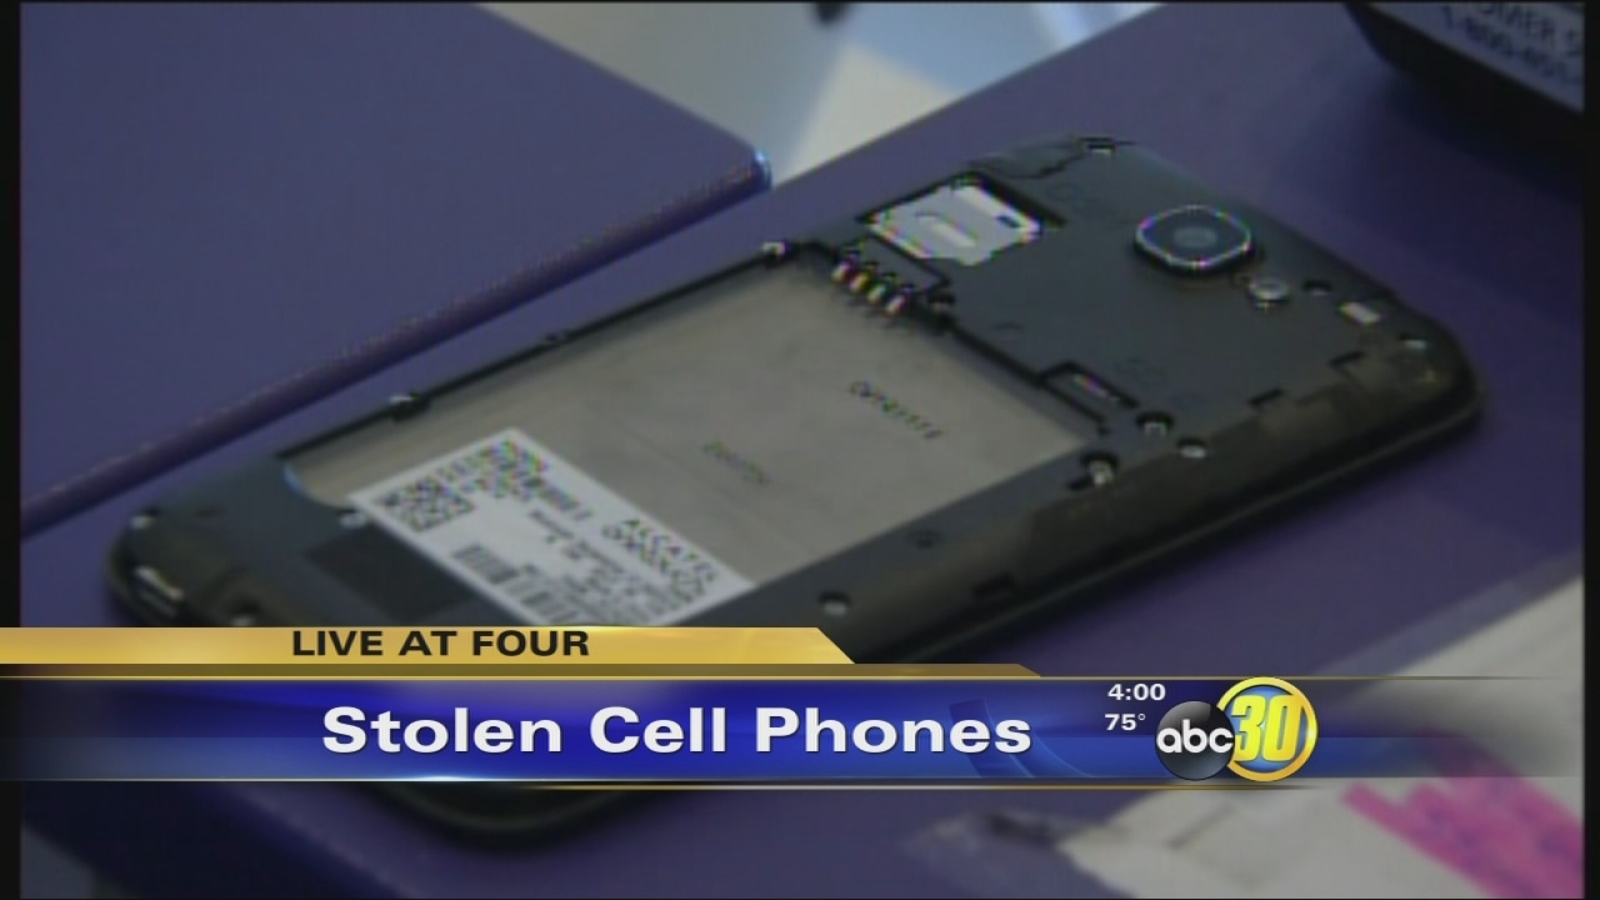 Stolen Visalia Metropcs Phones For Sale On Craigslist Abc30 Fresno